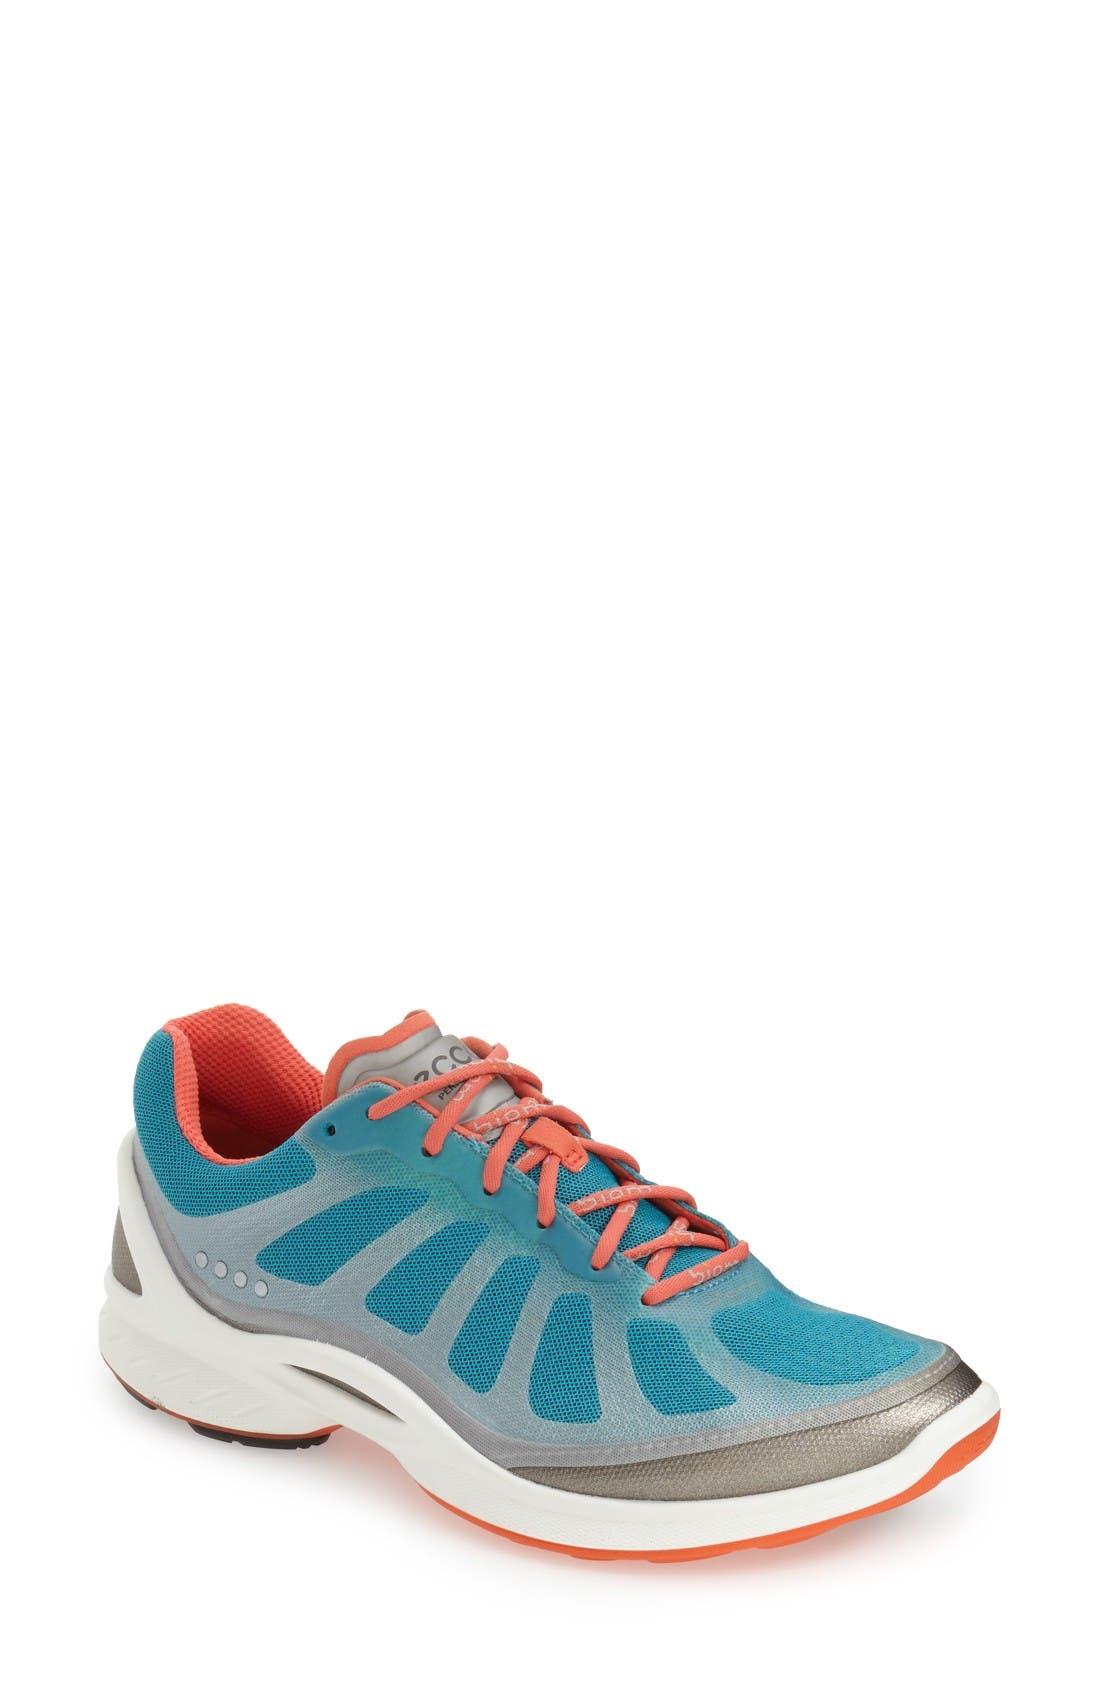 'BIOM Fjuel Racer' Sneaker,                         Main,                         color, Capri Breeze / Coral